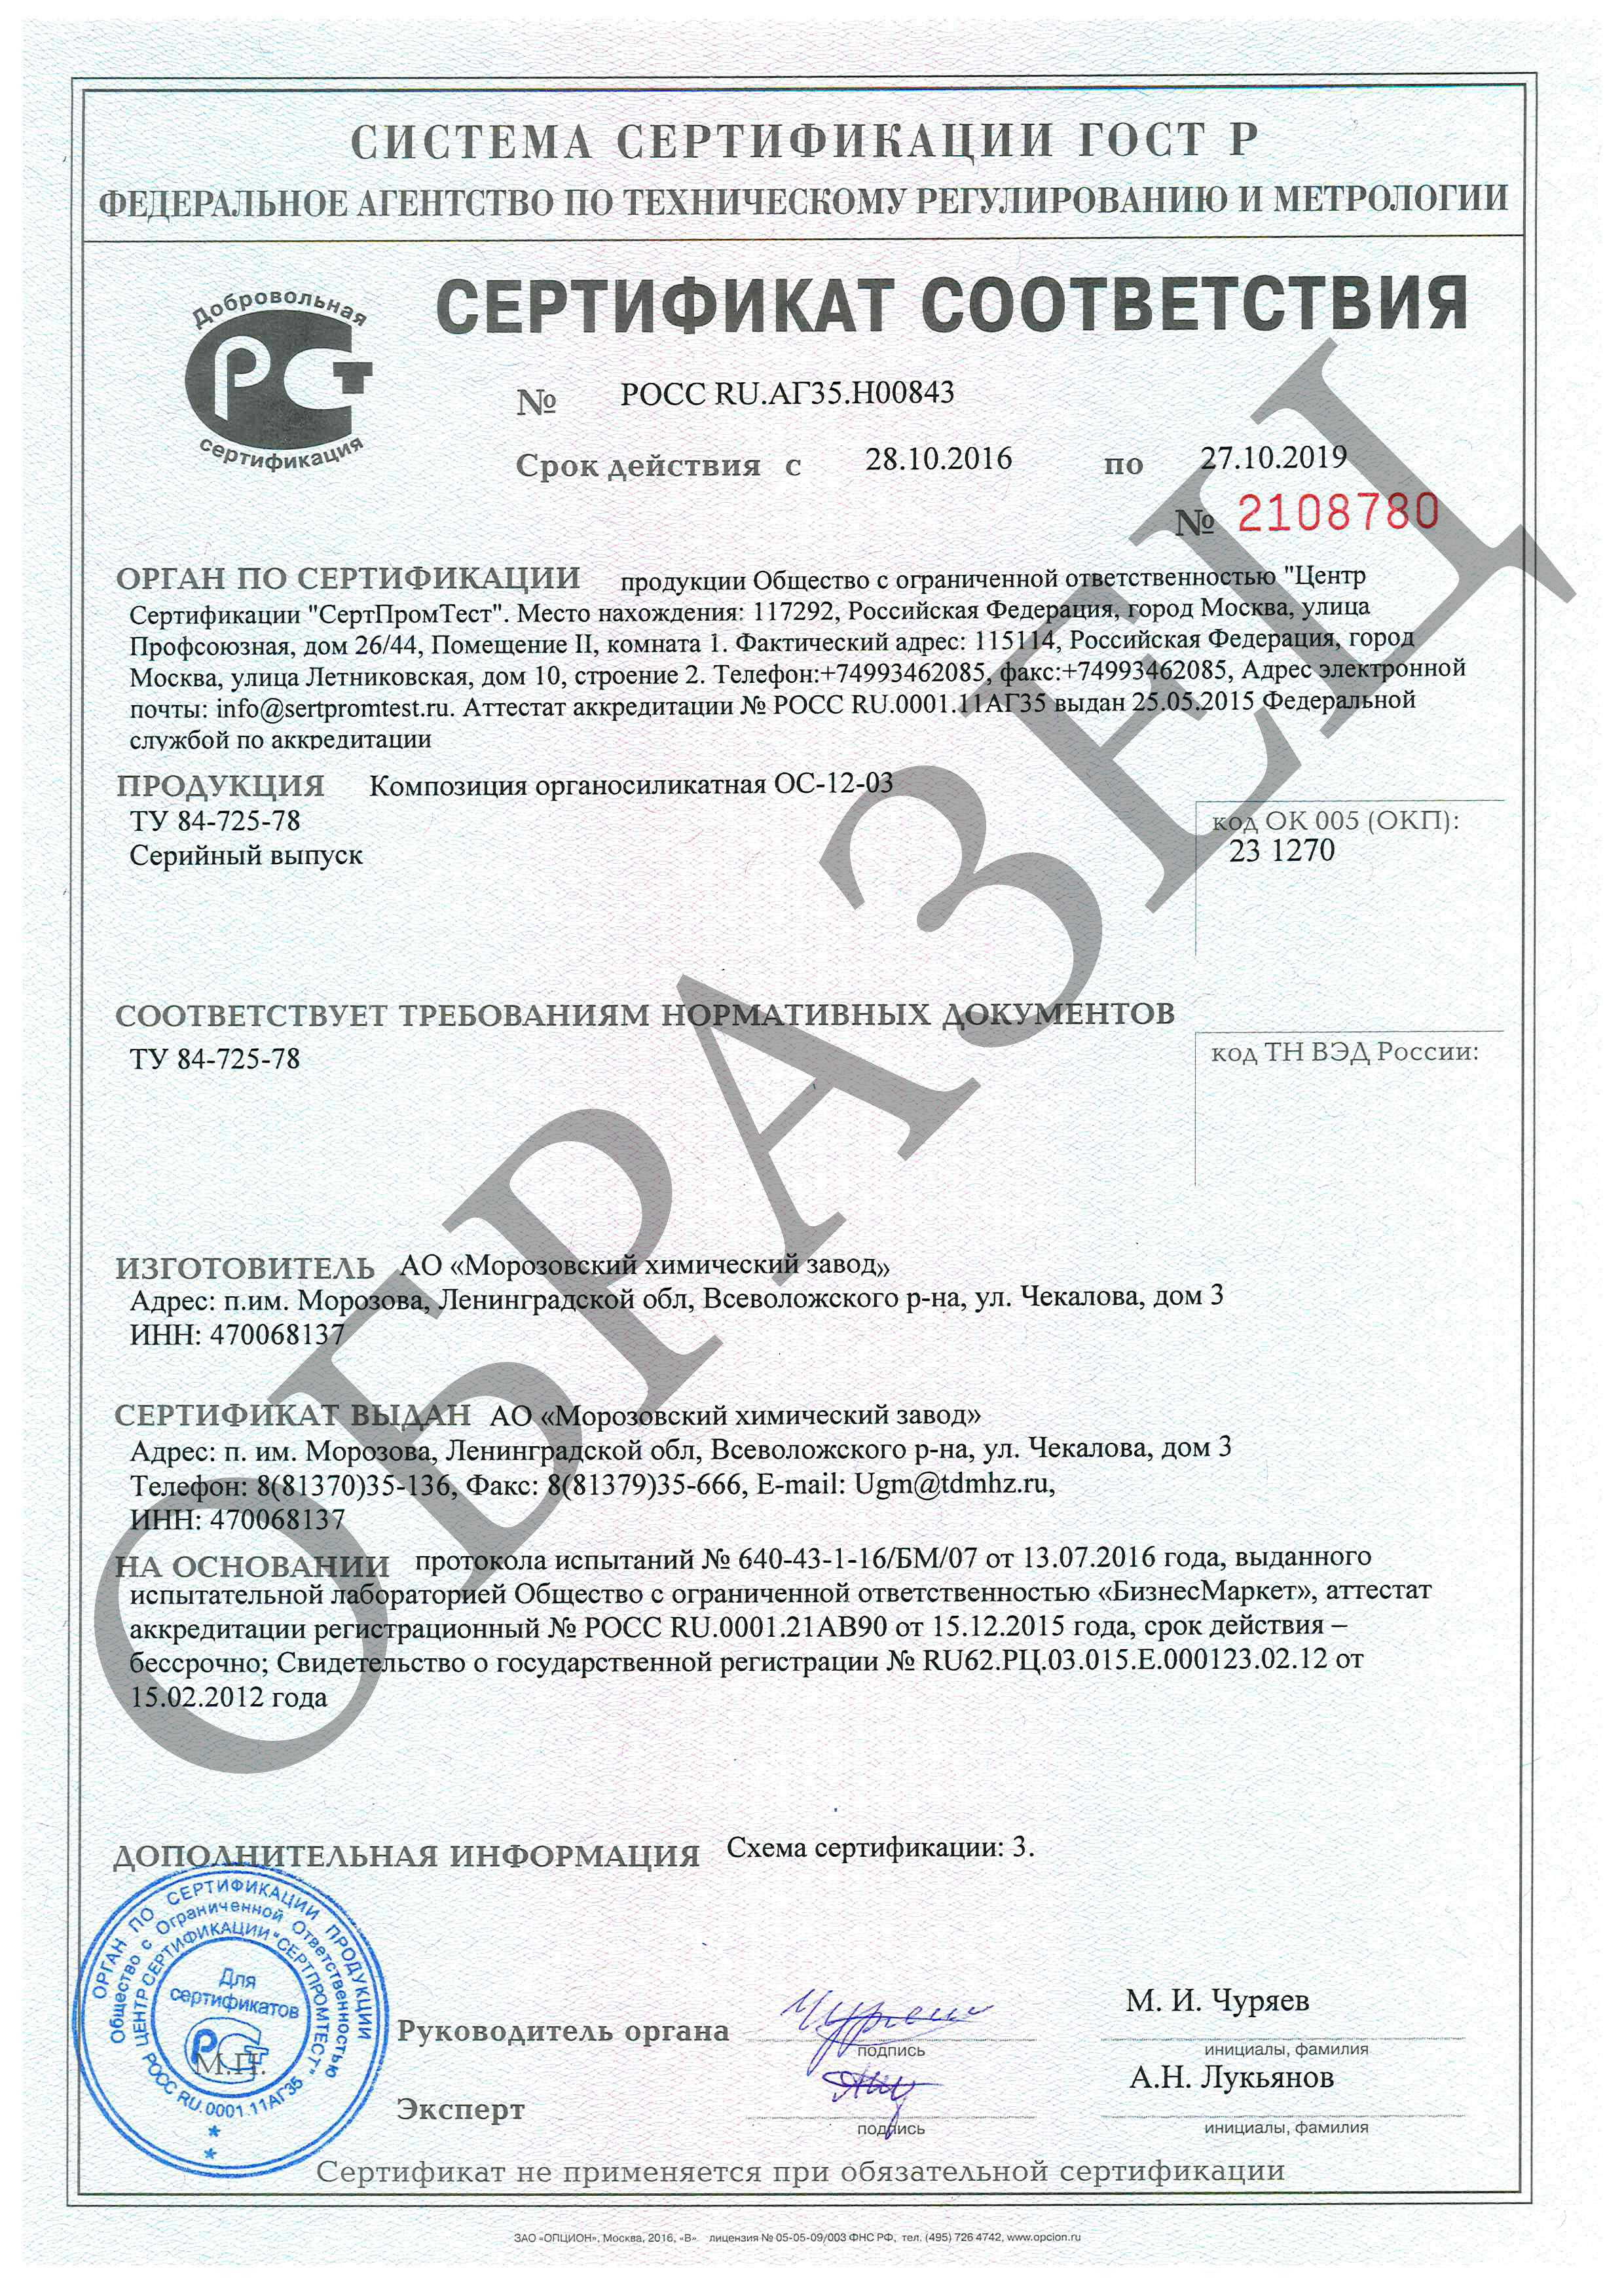 Сертификат ГОСТ Р ОС-12-03